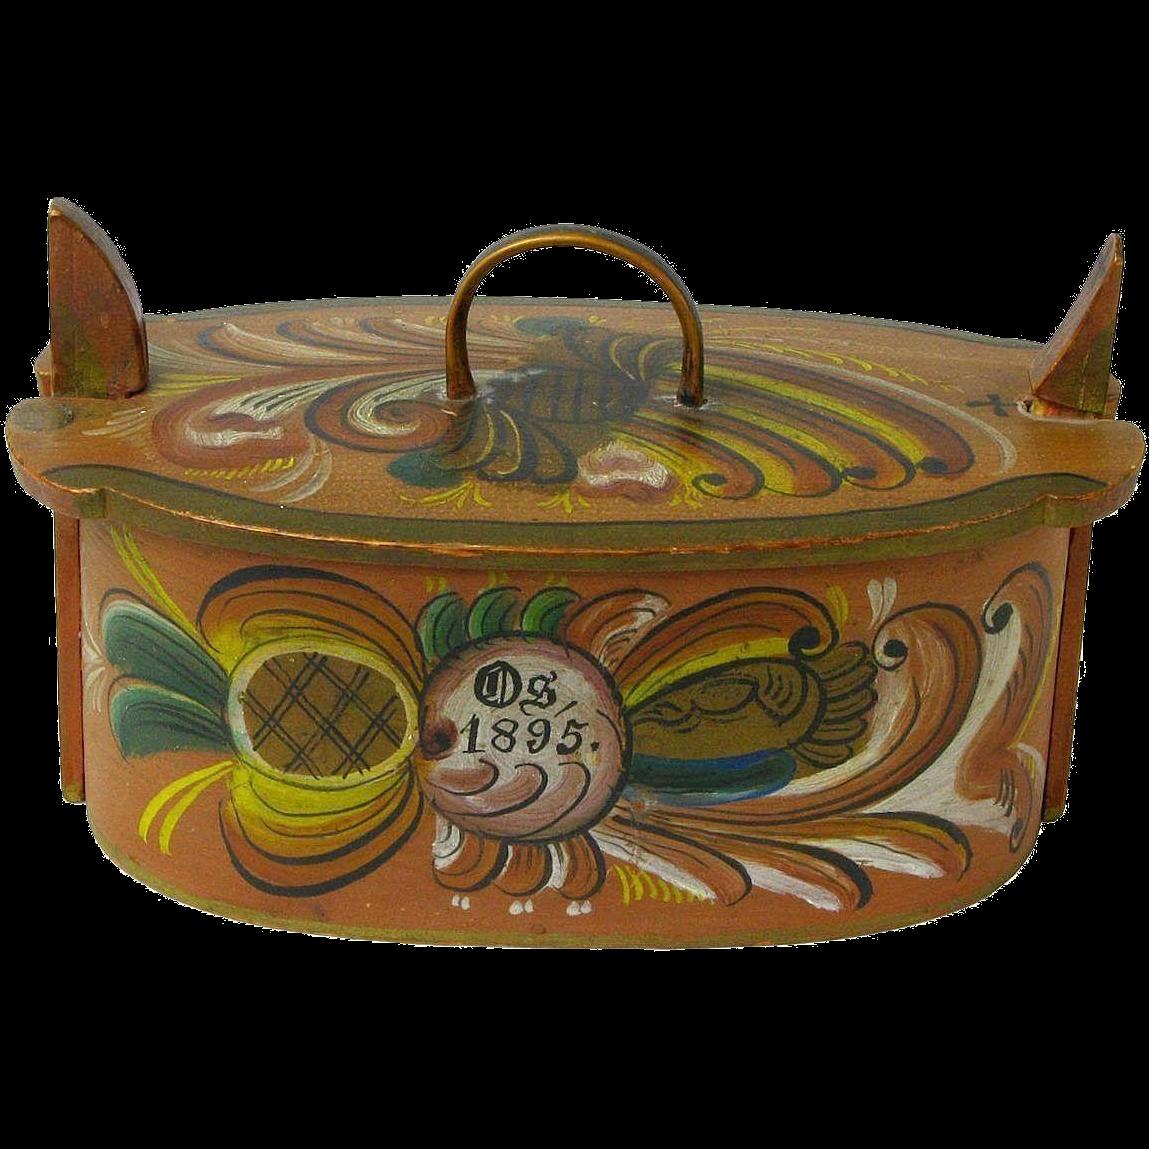 Os Rosemaling Painted Norwegian Tine Bentwood Box, Dated 1895